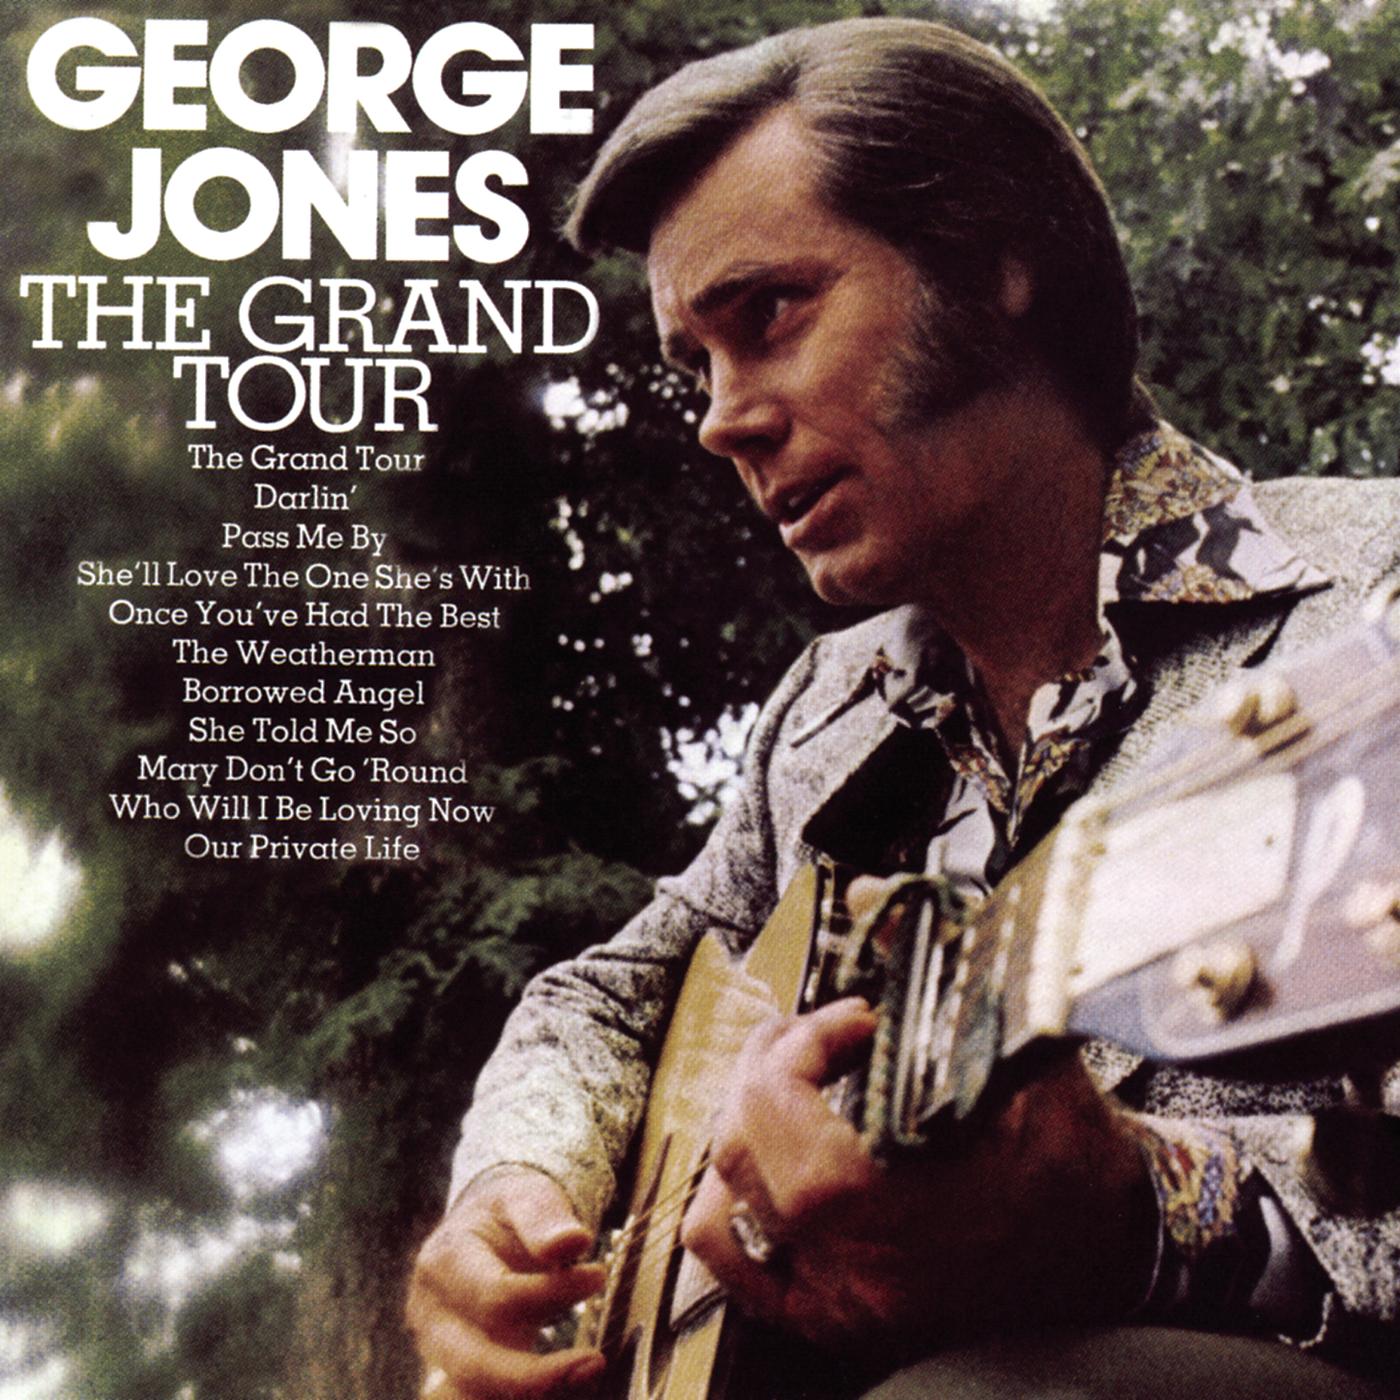 The Grand Tour - George Jones